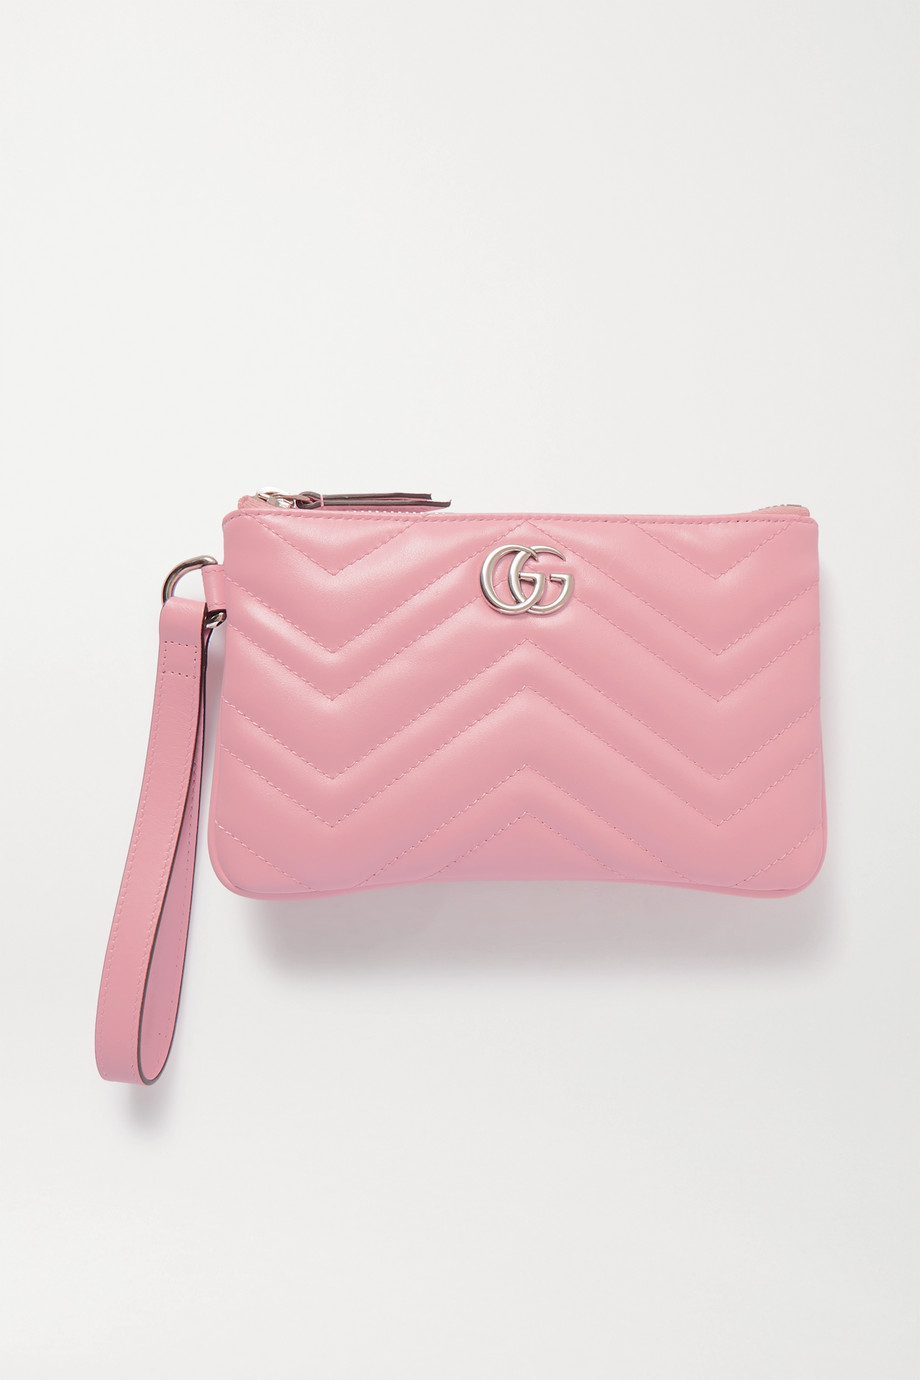 Gucci GG Marmont 绗缝皮革手拿包